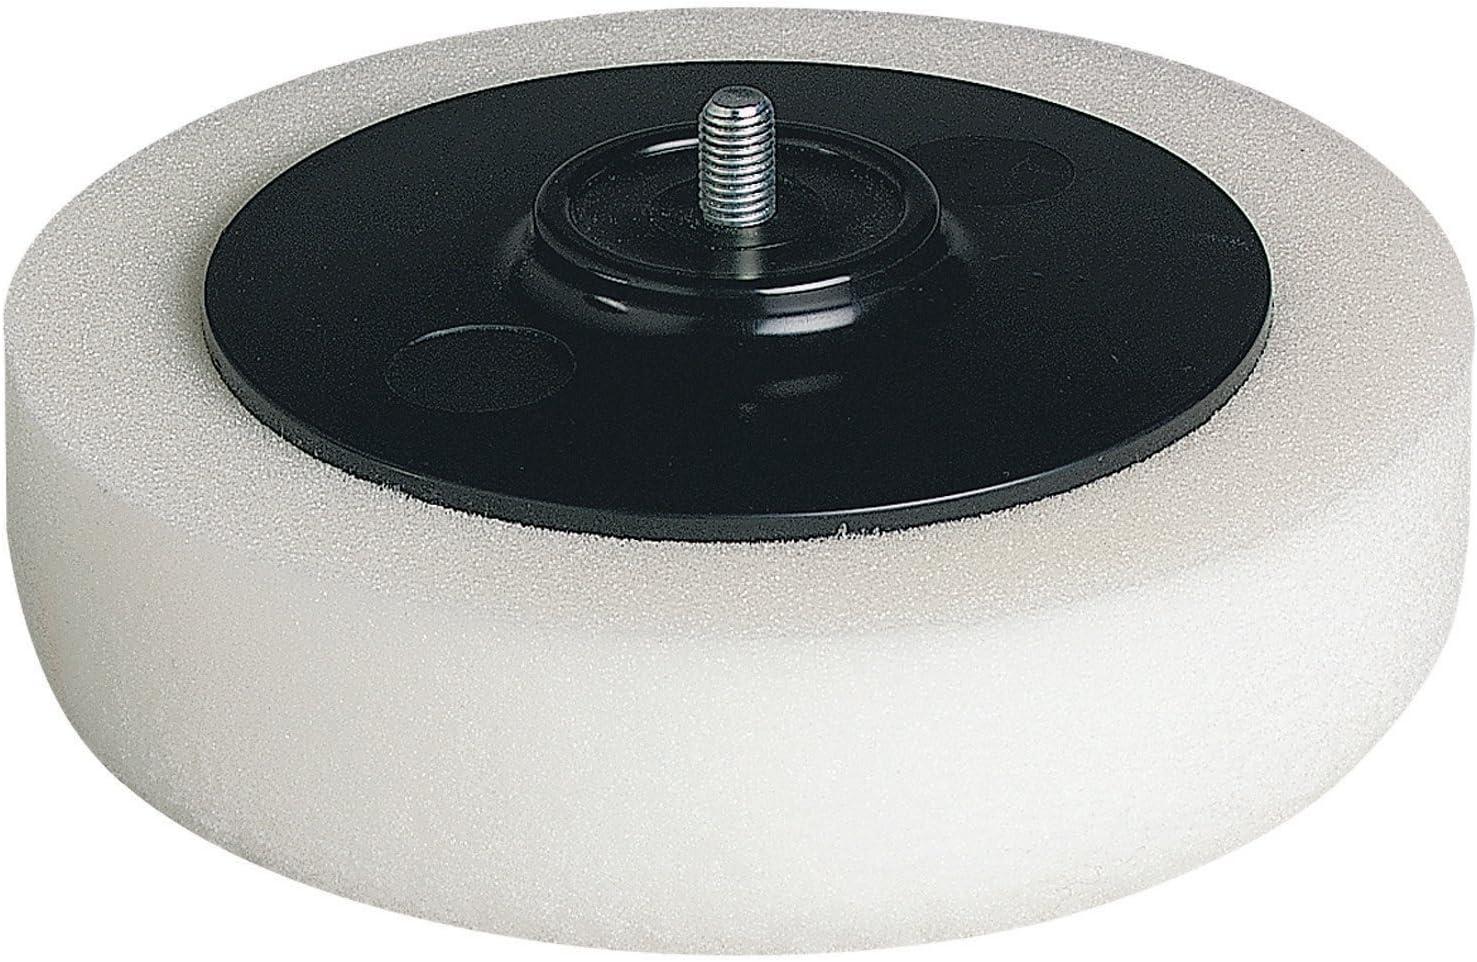 Porter Cable (2 Pack) 54745 Polishing Pad for 7424 Polisher # 54745-2pk